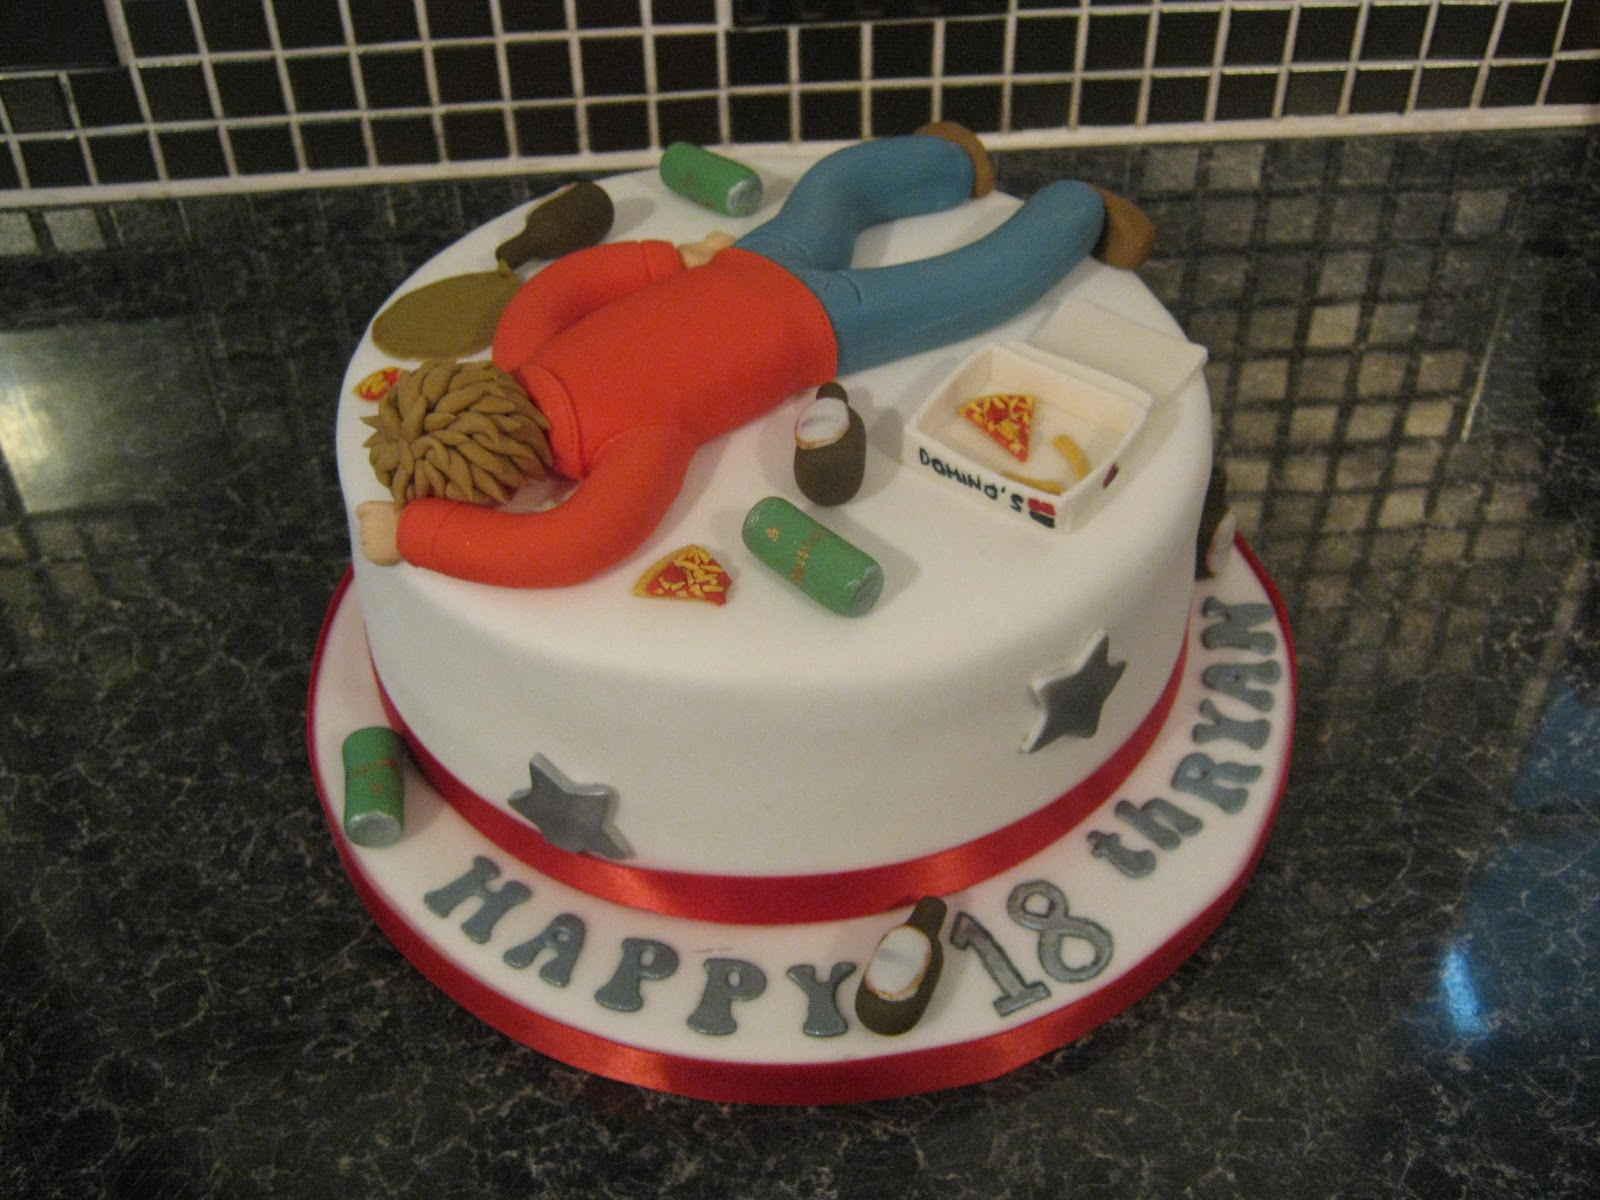 18th Birthday Cake For Boys 18th Birthday Cakes Boys Fitfru Style